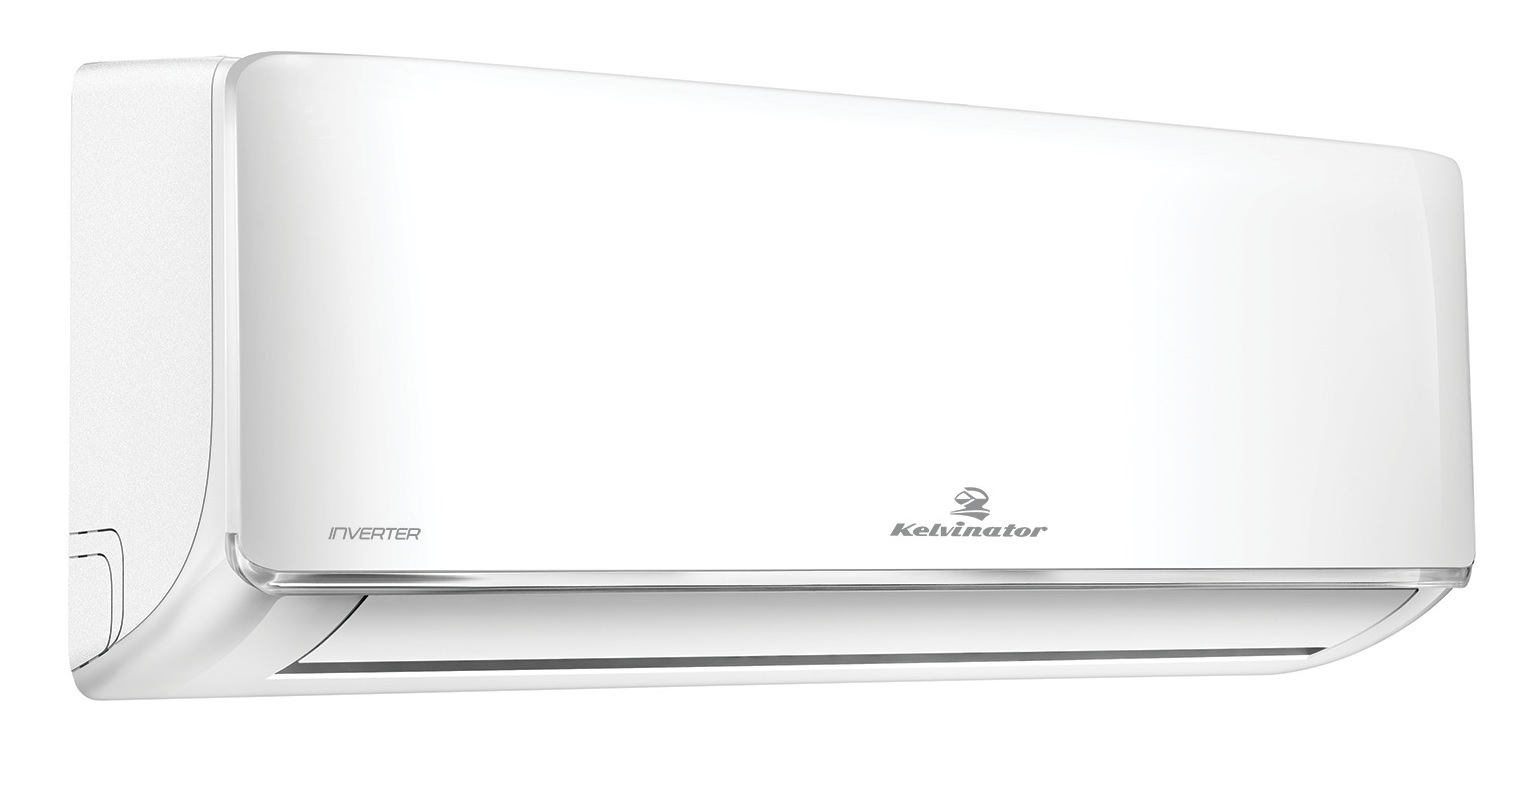 Kelvinator KSD71HWH Air Conditioner